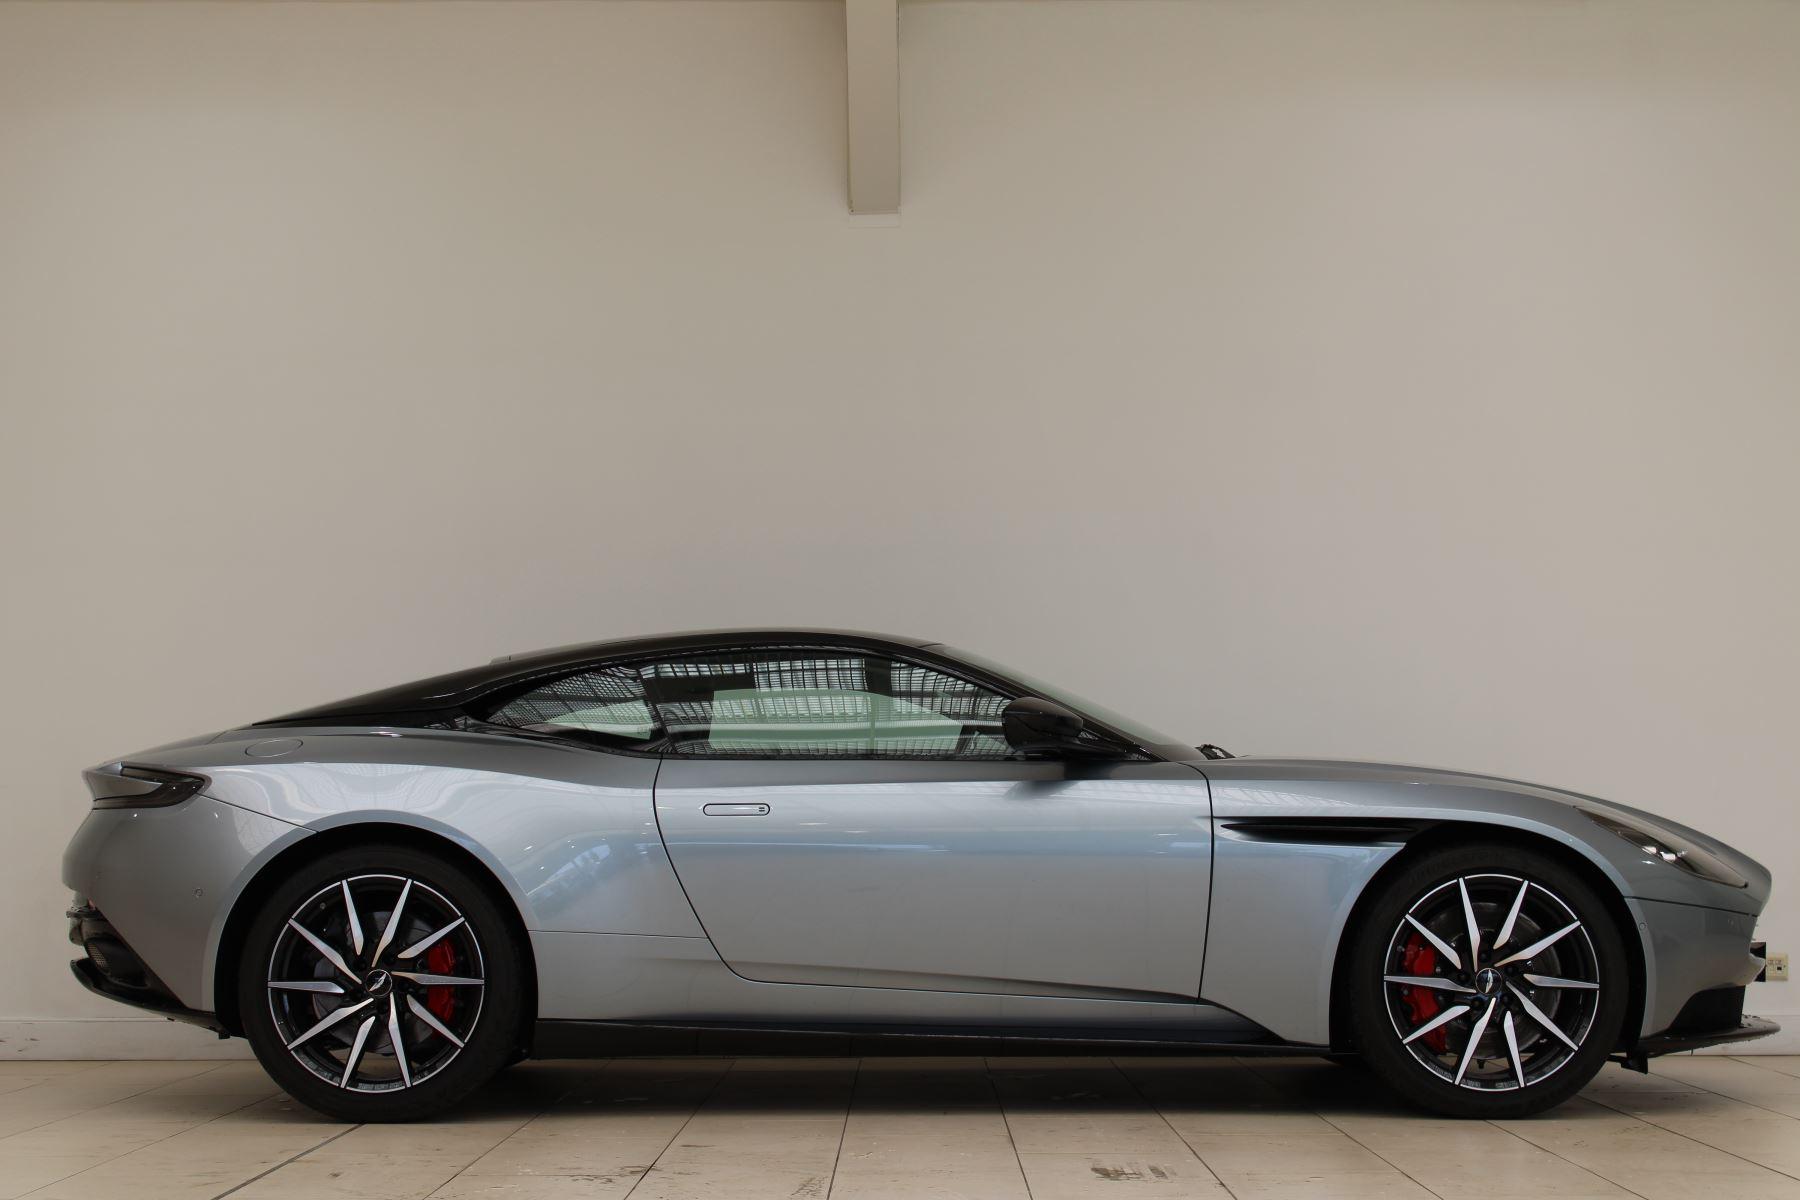 Aston Martin DB11 V8 2dr Touchtronic Auto image 4